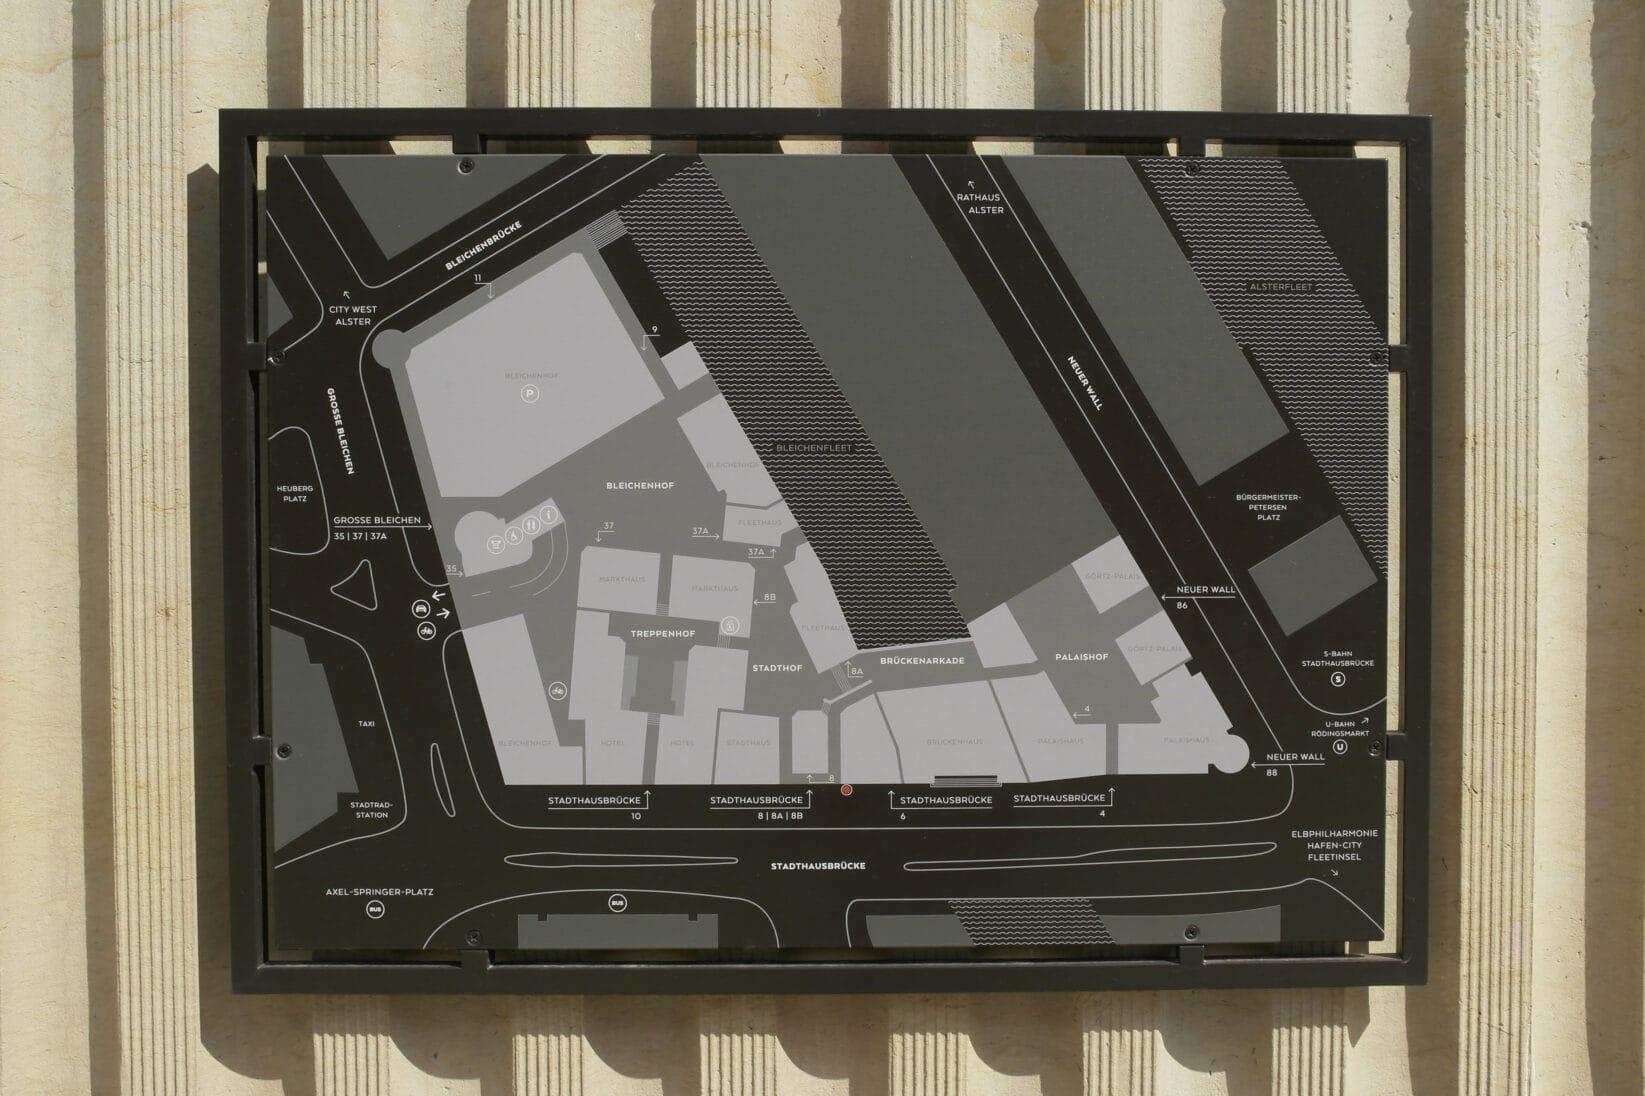 Stadthöfe Hamburg Leitsystem Plan